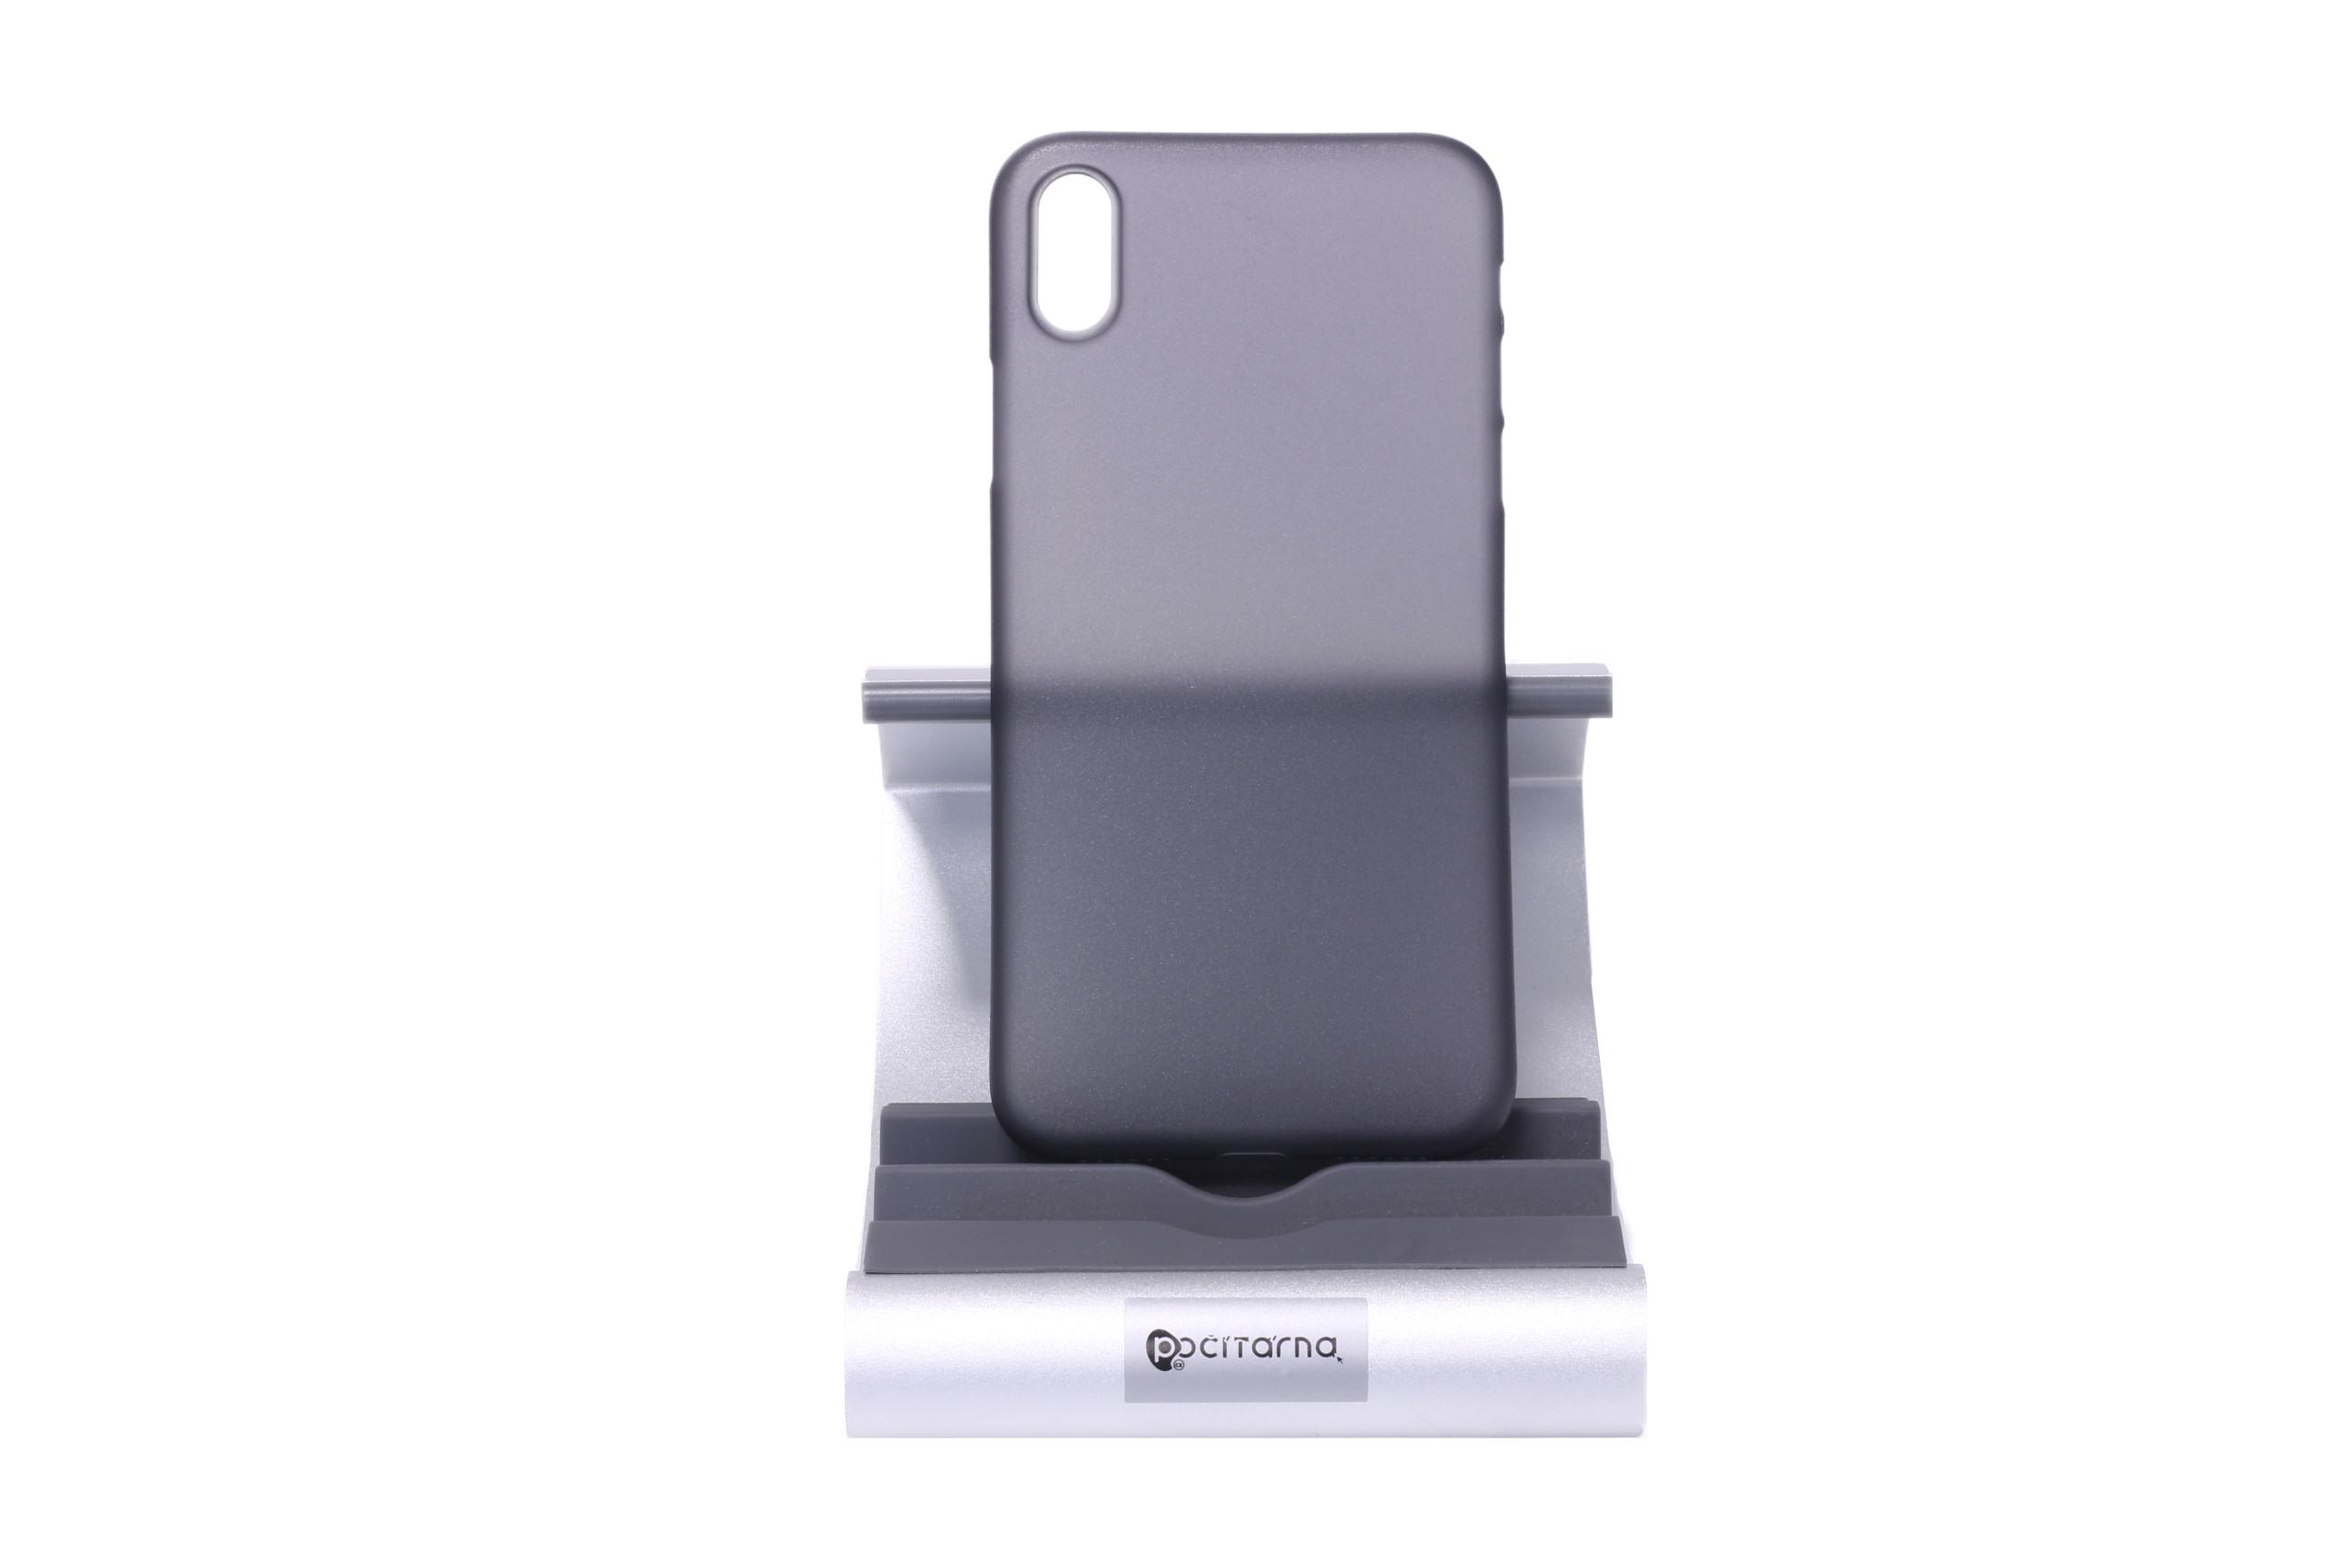 Ochranný kryt pro iPhone X/Xs - Šedý